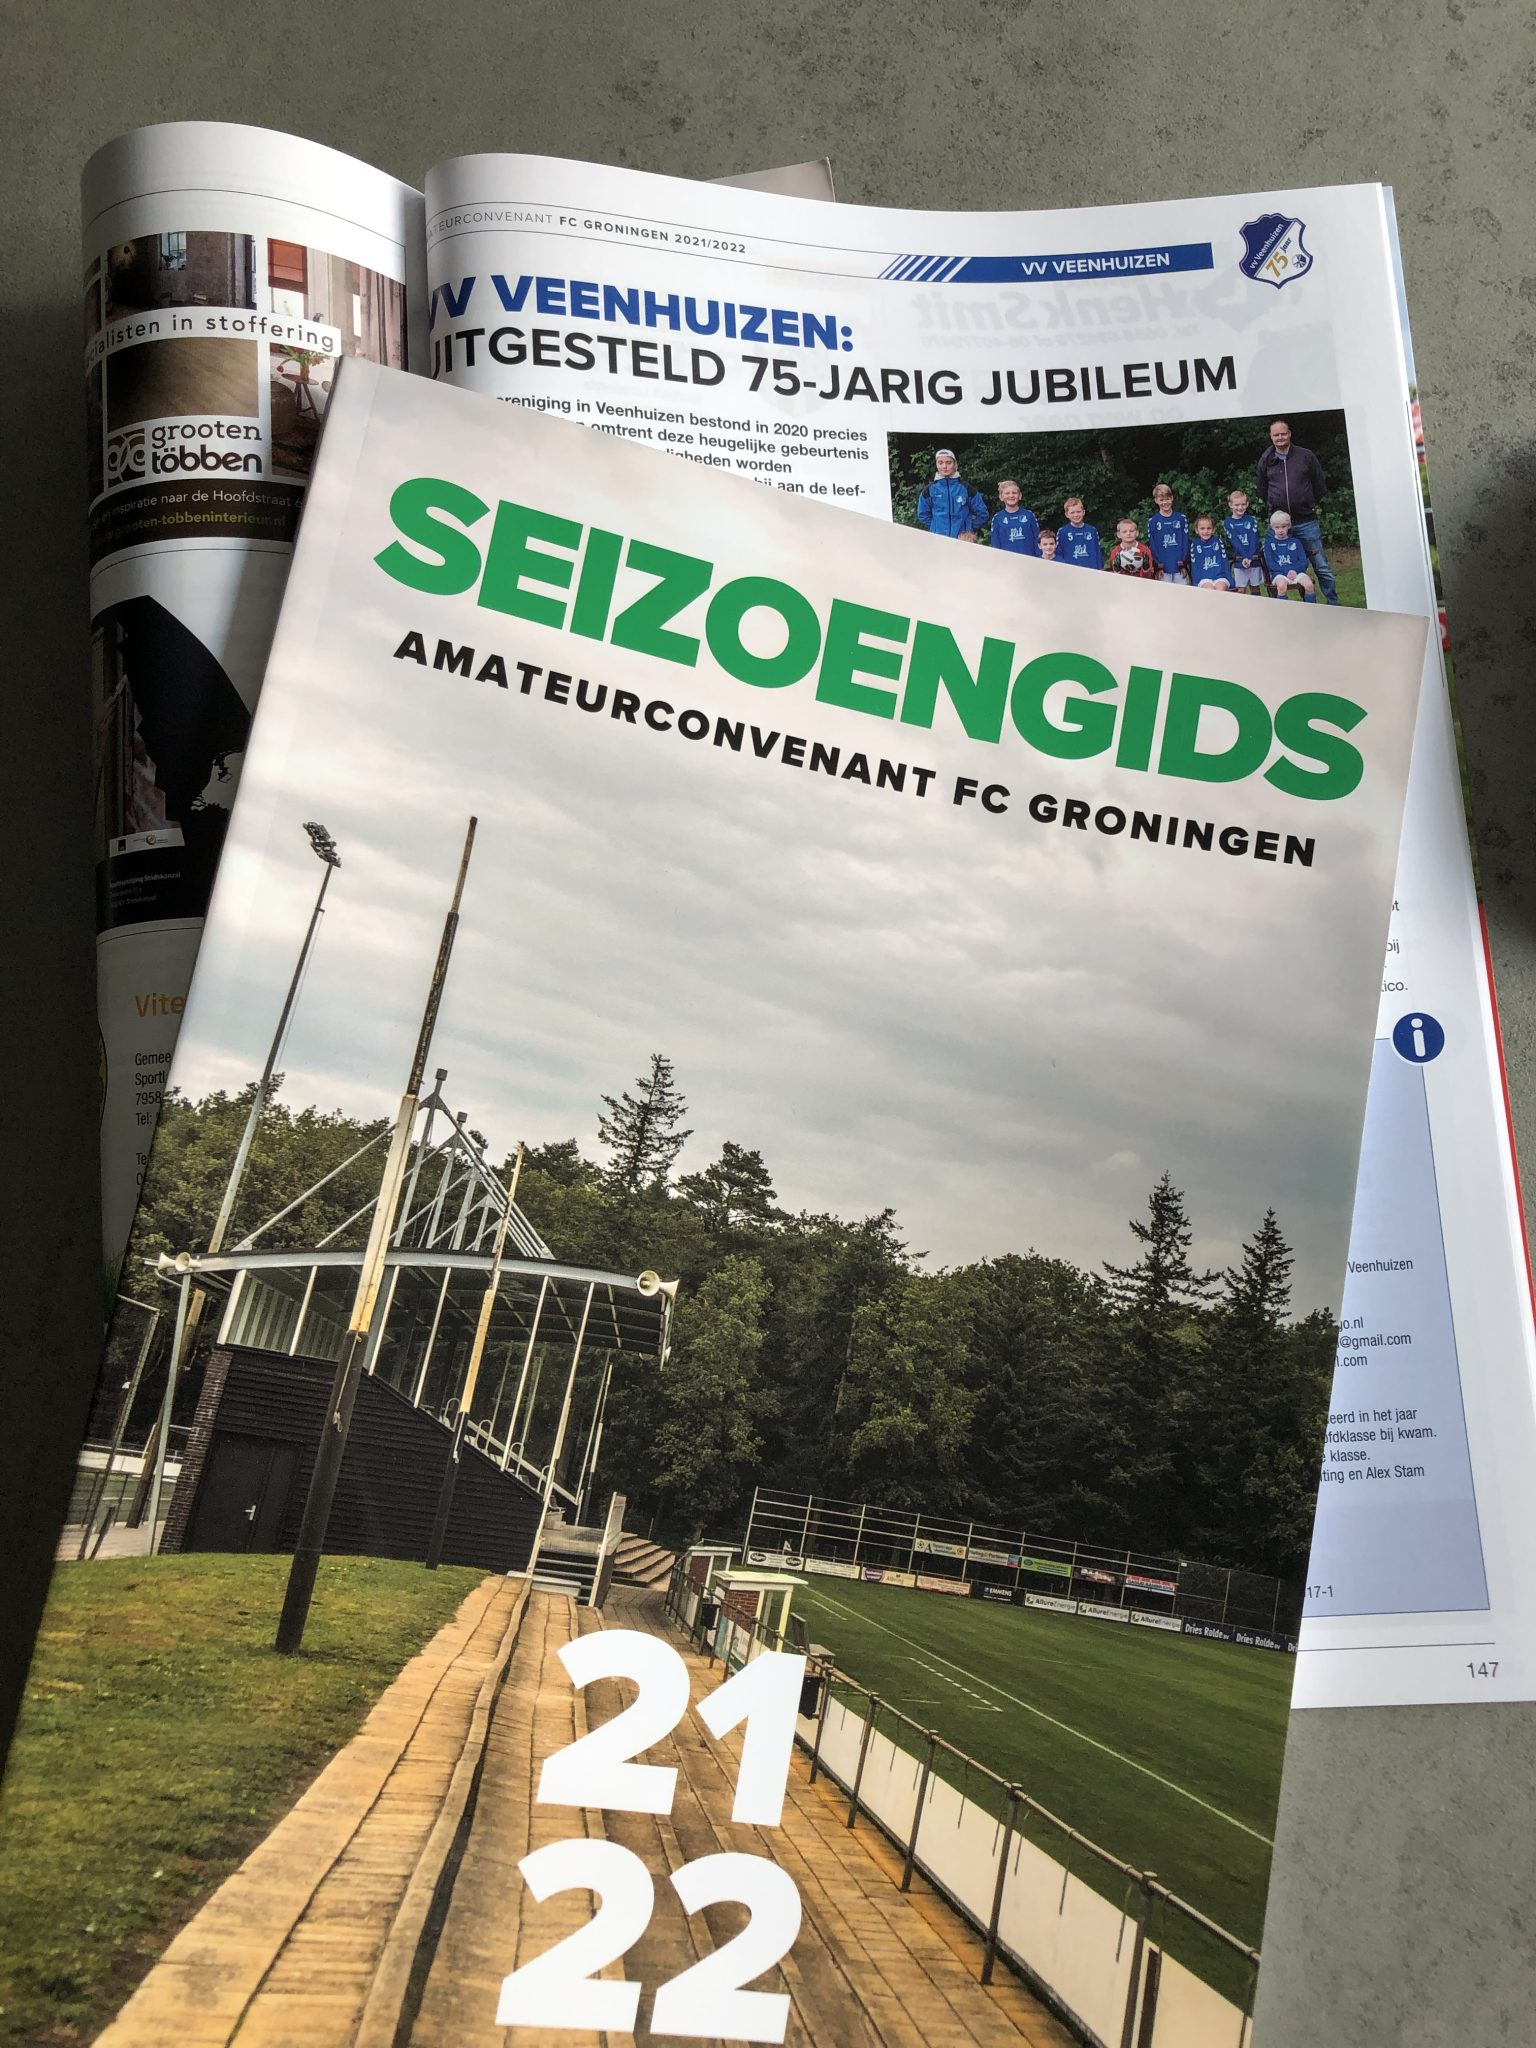 Seizoengids amateurconvenant FC Groningen 21/22